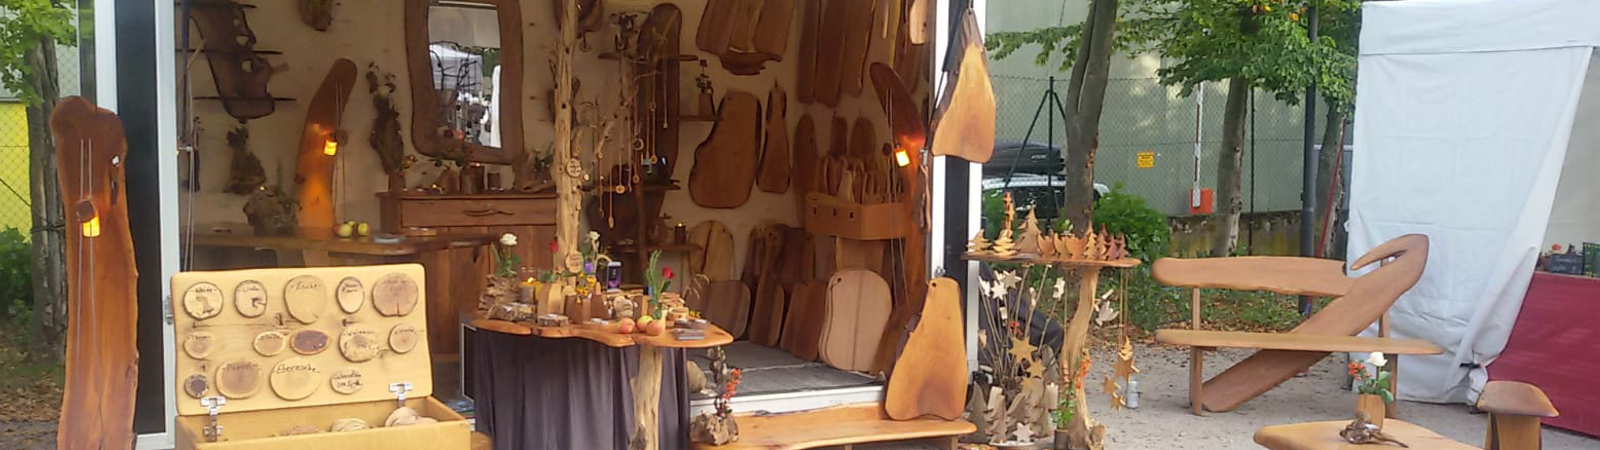 Slider-Kunsthandwerkermarkt_lindlar_2t_10